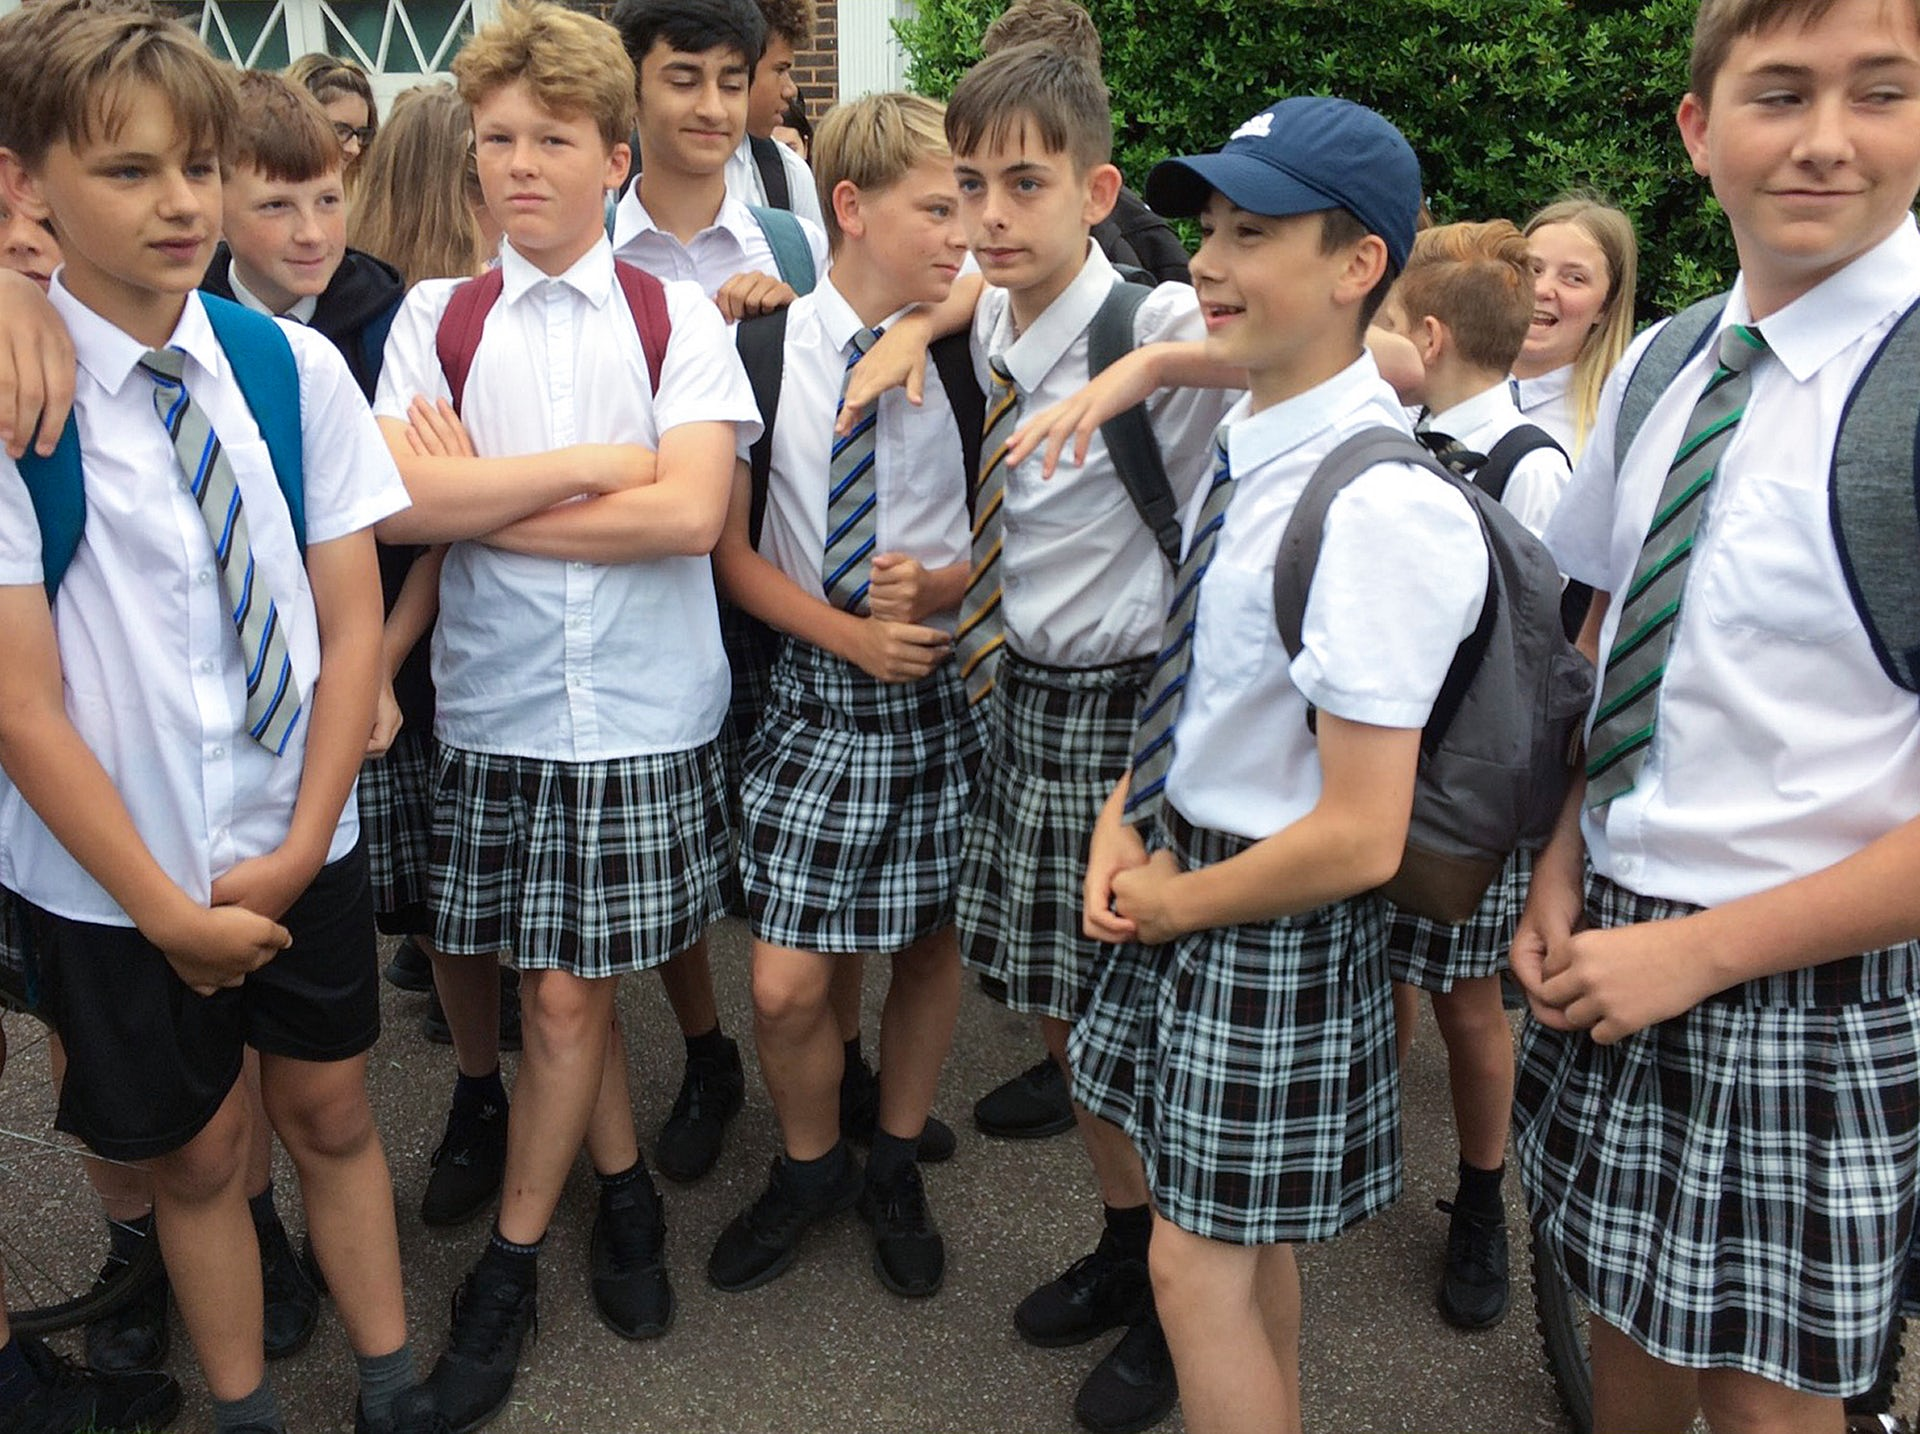 Teenage Boys Come To School Wearing Skirts